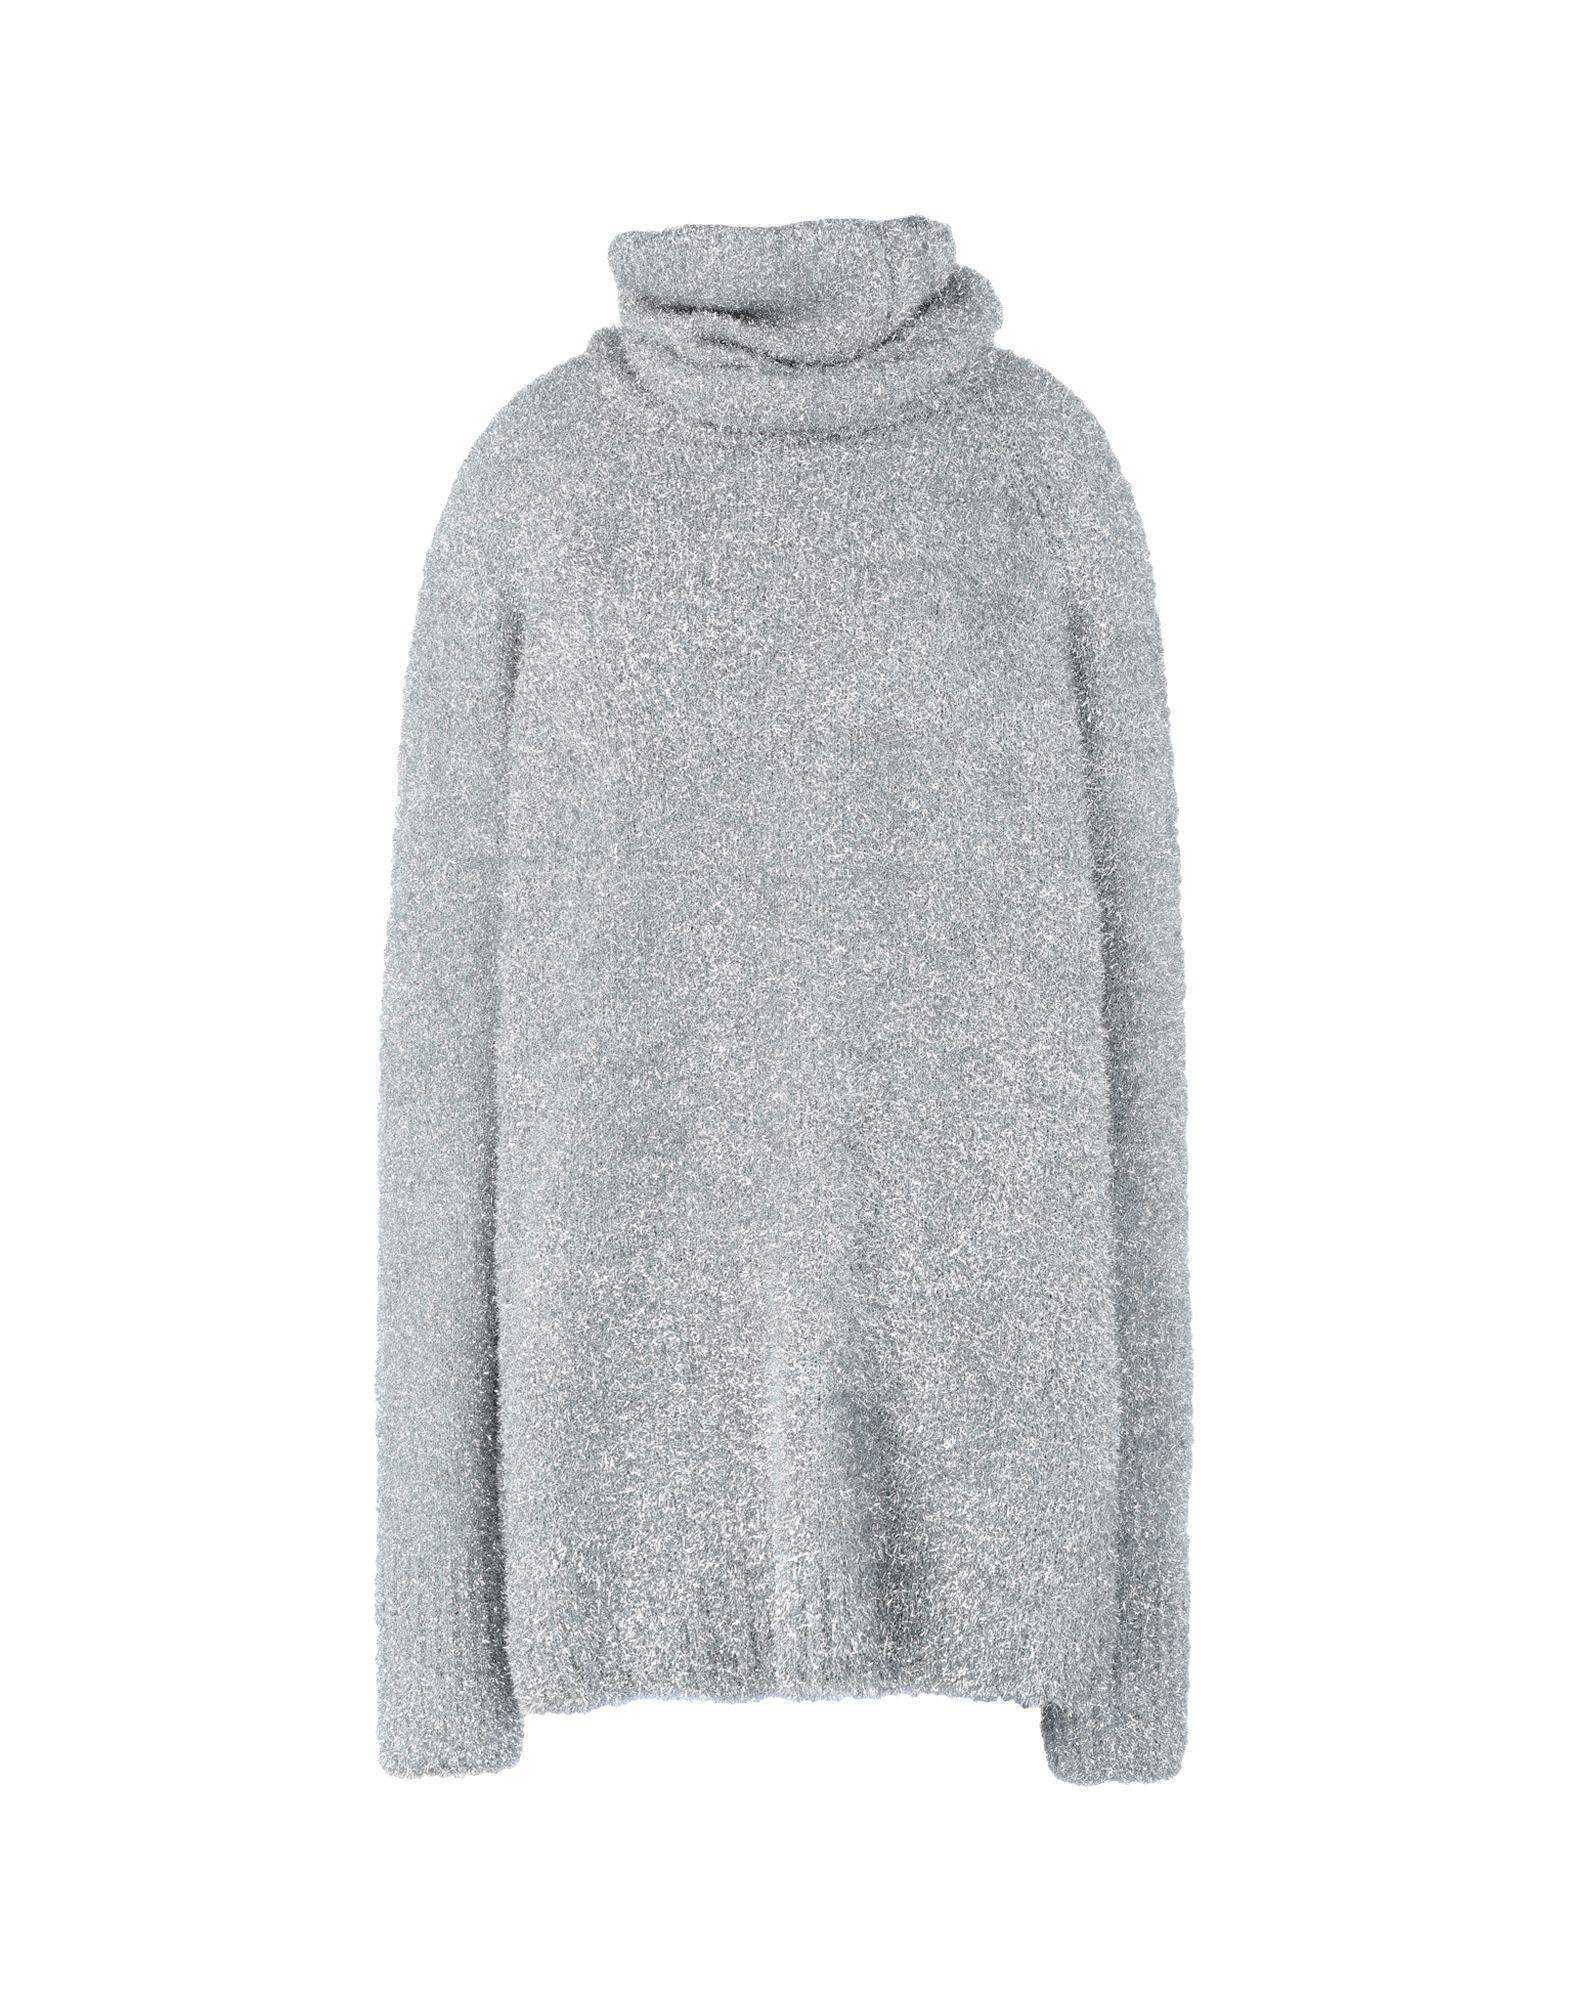 FRONT ROW SHOP Свитер the row свитер